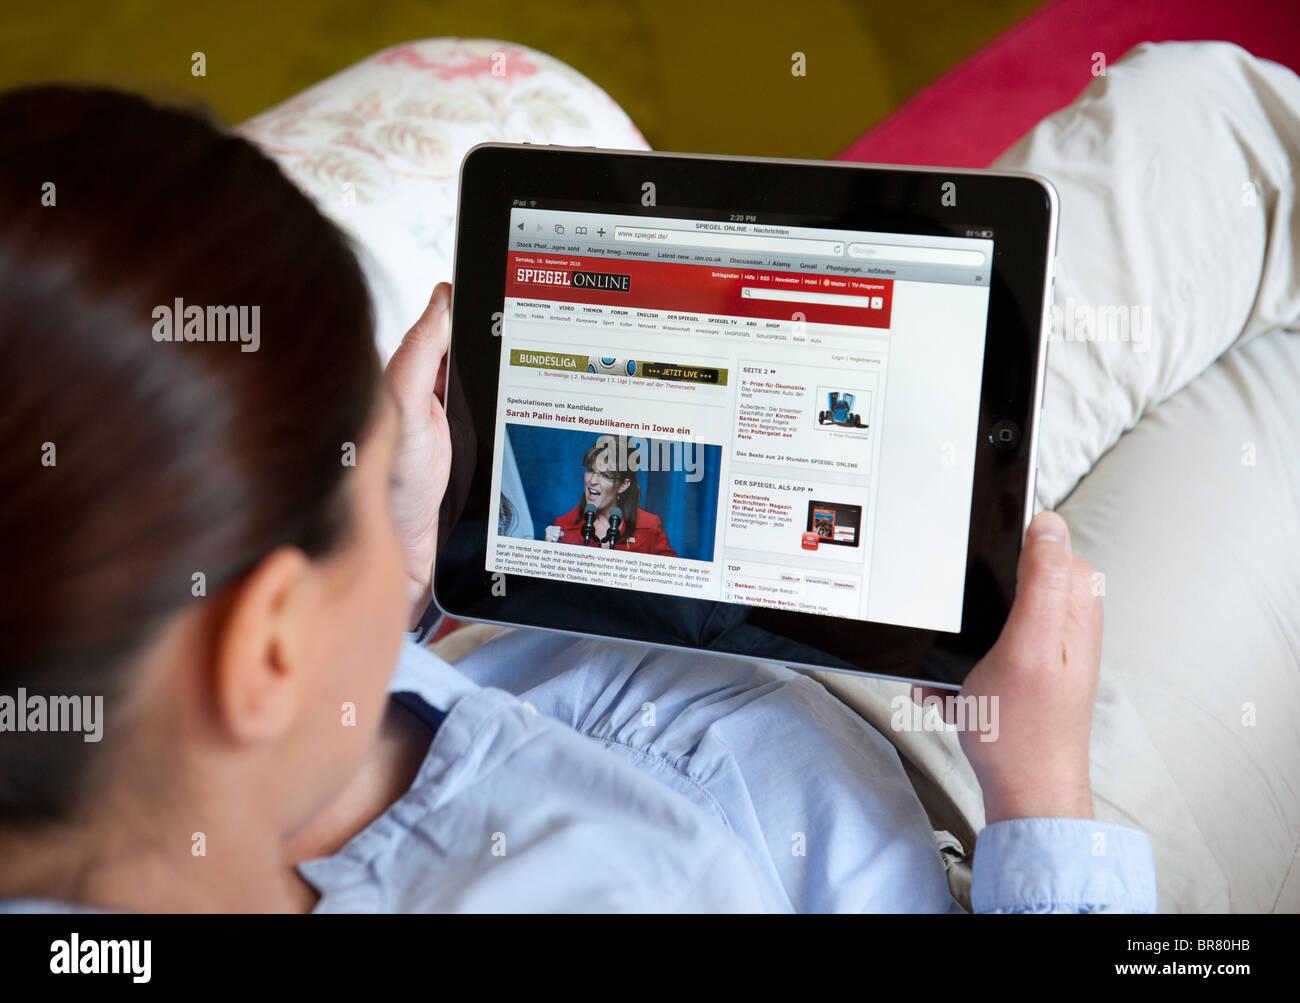 Woman using iPad tablet computer to read Der Spiegel magazine online - Stock Image